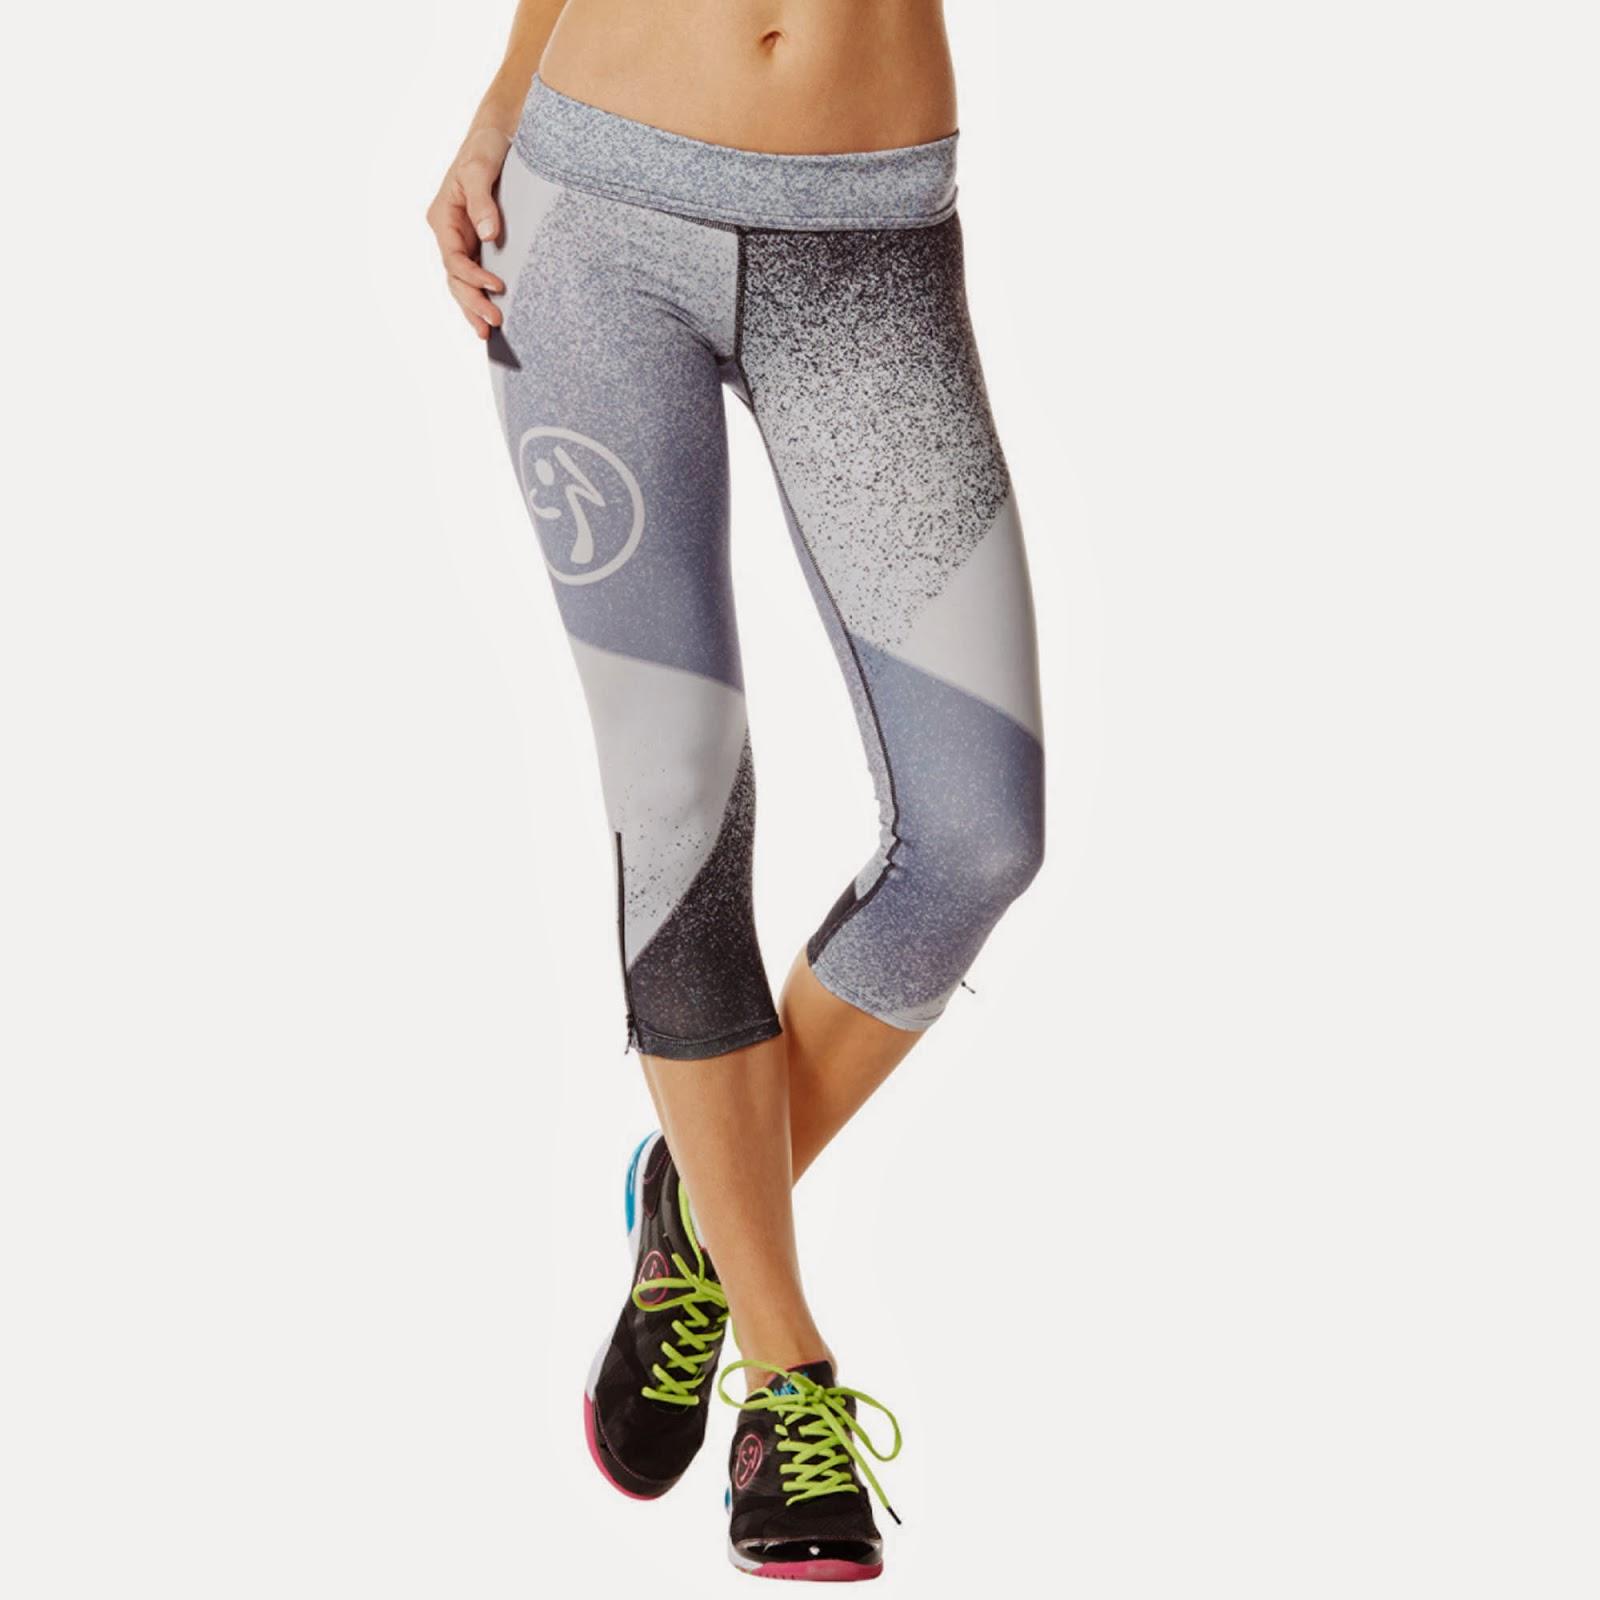 http://www.zumba.com/en-US/store/US/product/so-shaded-capri-leggings?color=Smoke